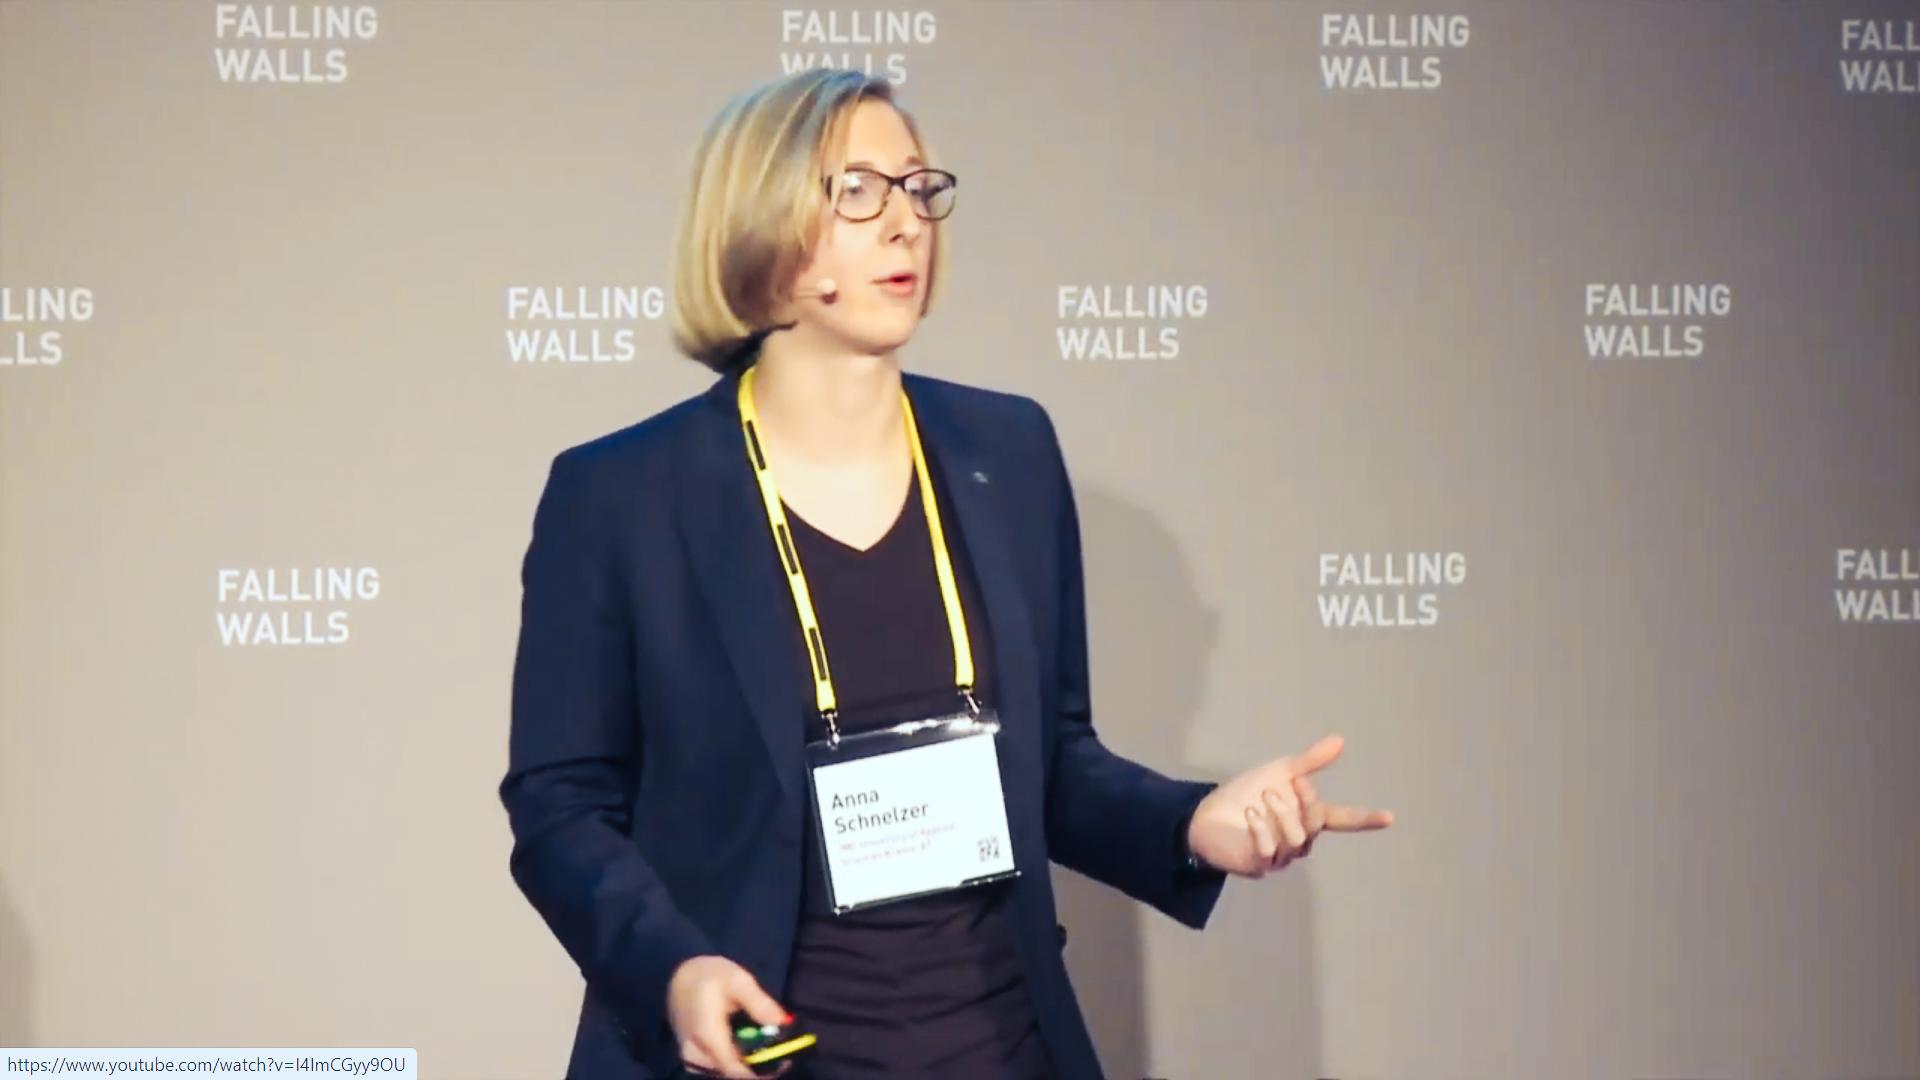 Anna Schnelzer at Falling Walls Pitch